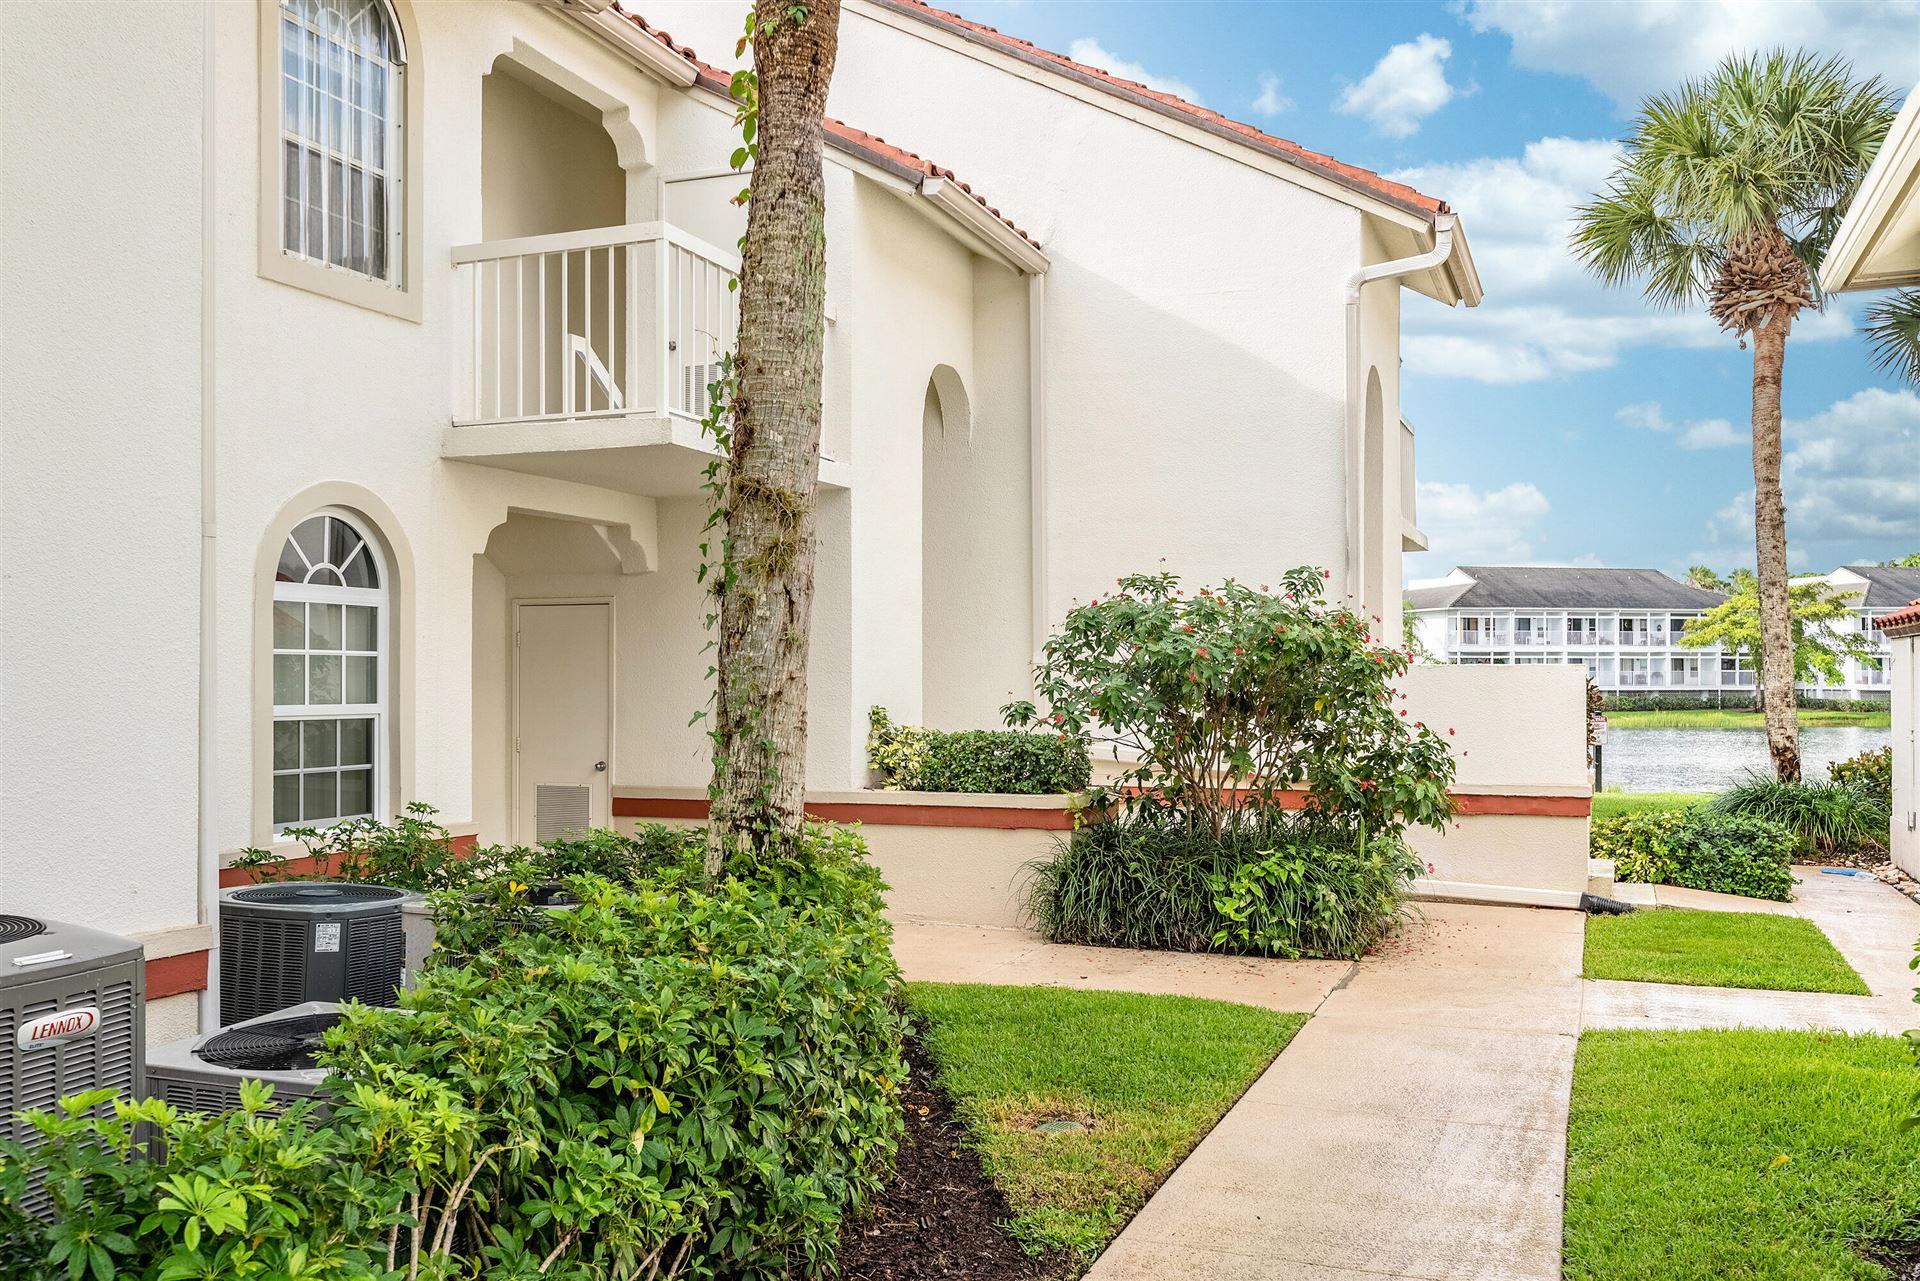 Photo of 213 Cypress Point Drive, Palm Beach Gardens, FL 33418 (MLS # RX-10728789)